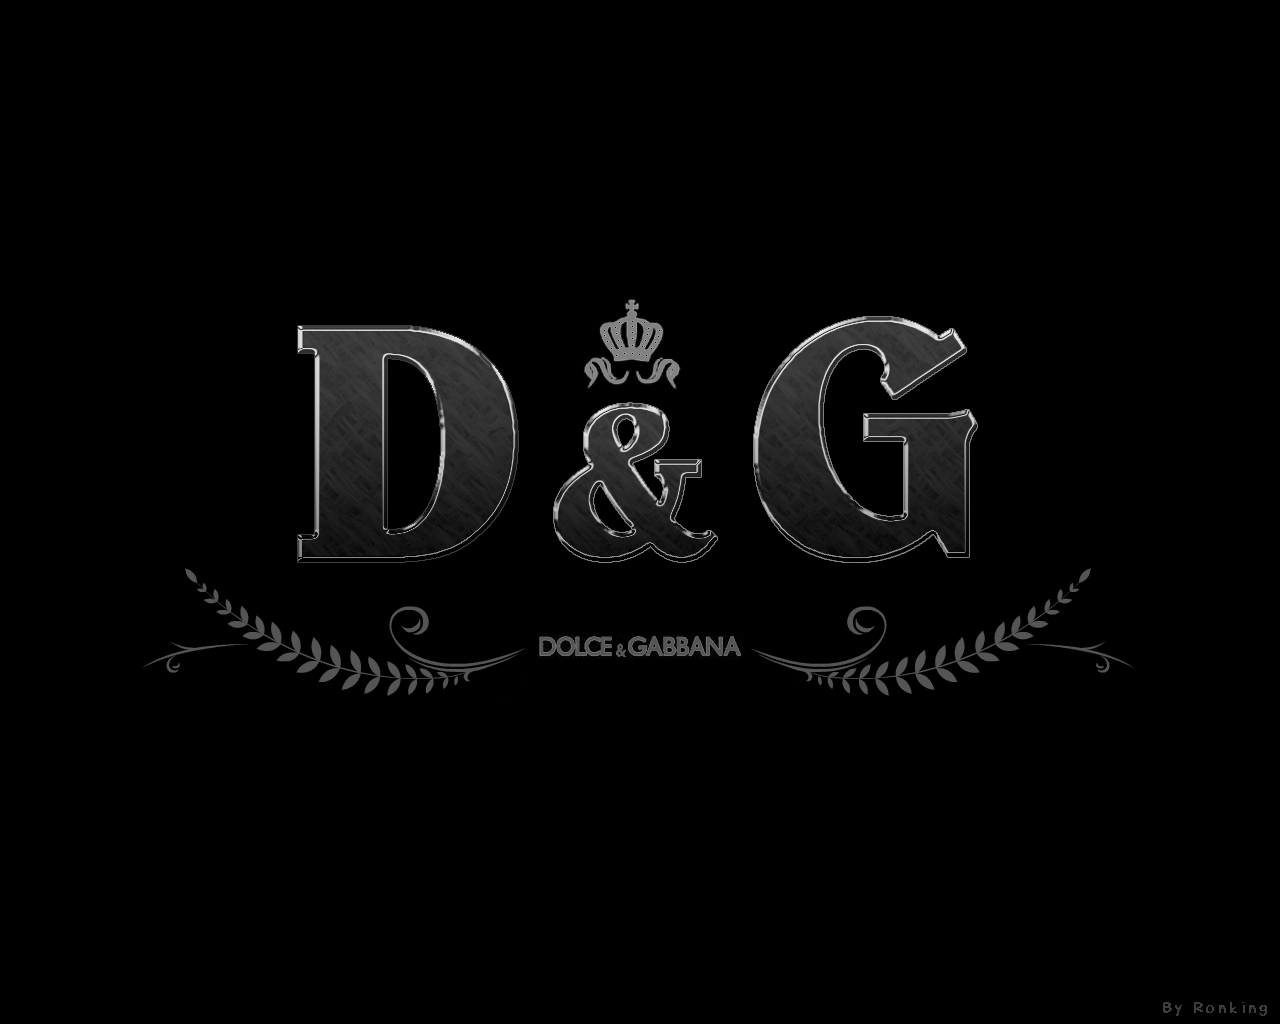 dolce-and-gabbana-logo-wallpaper